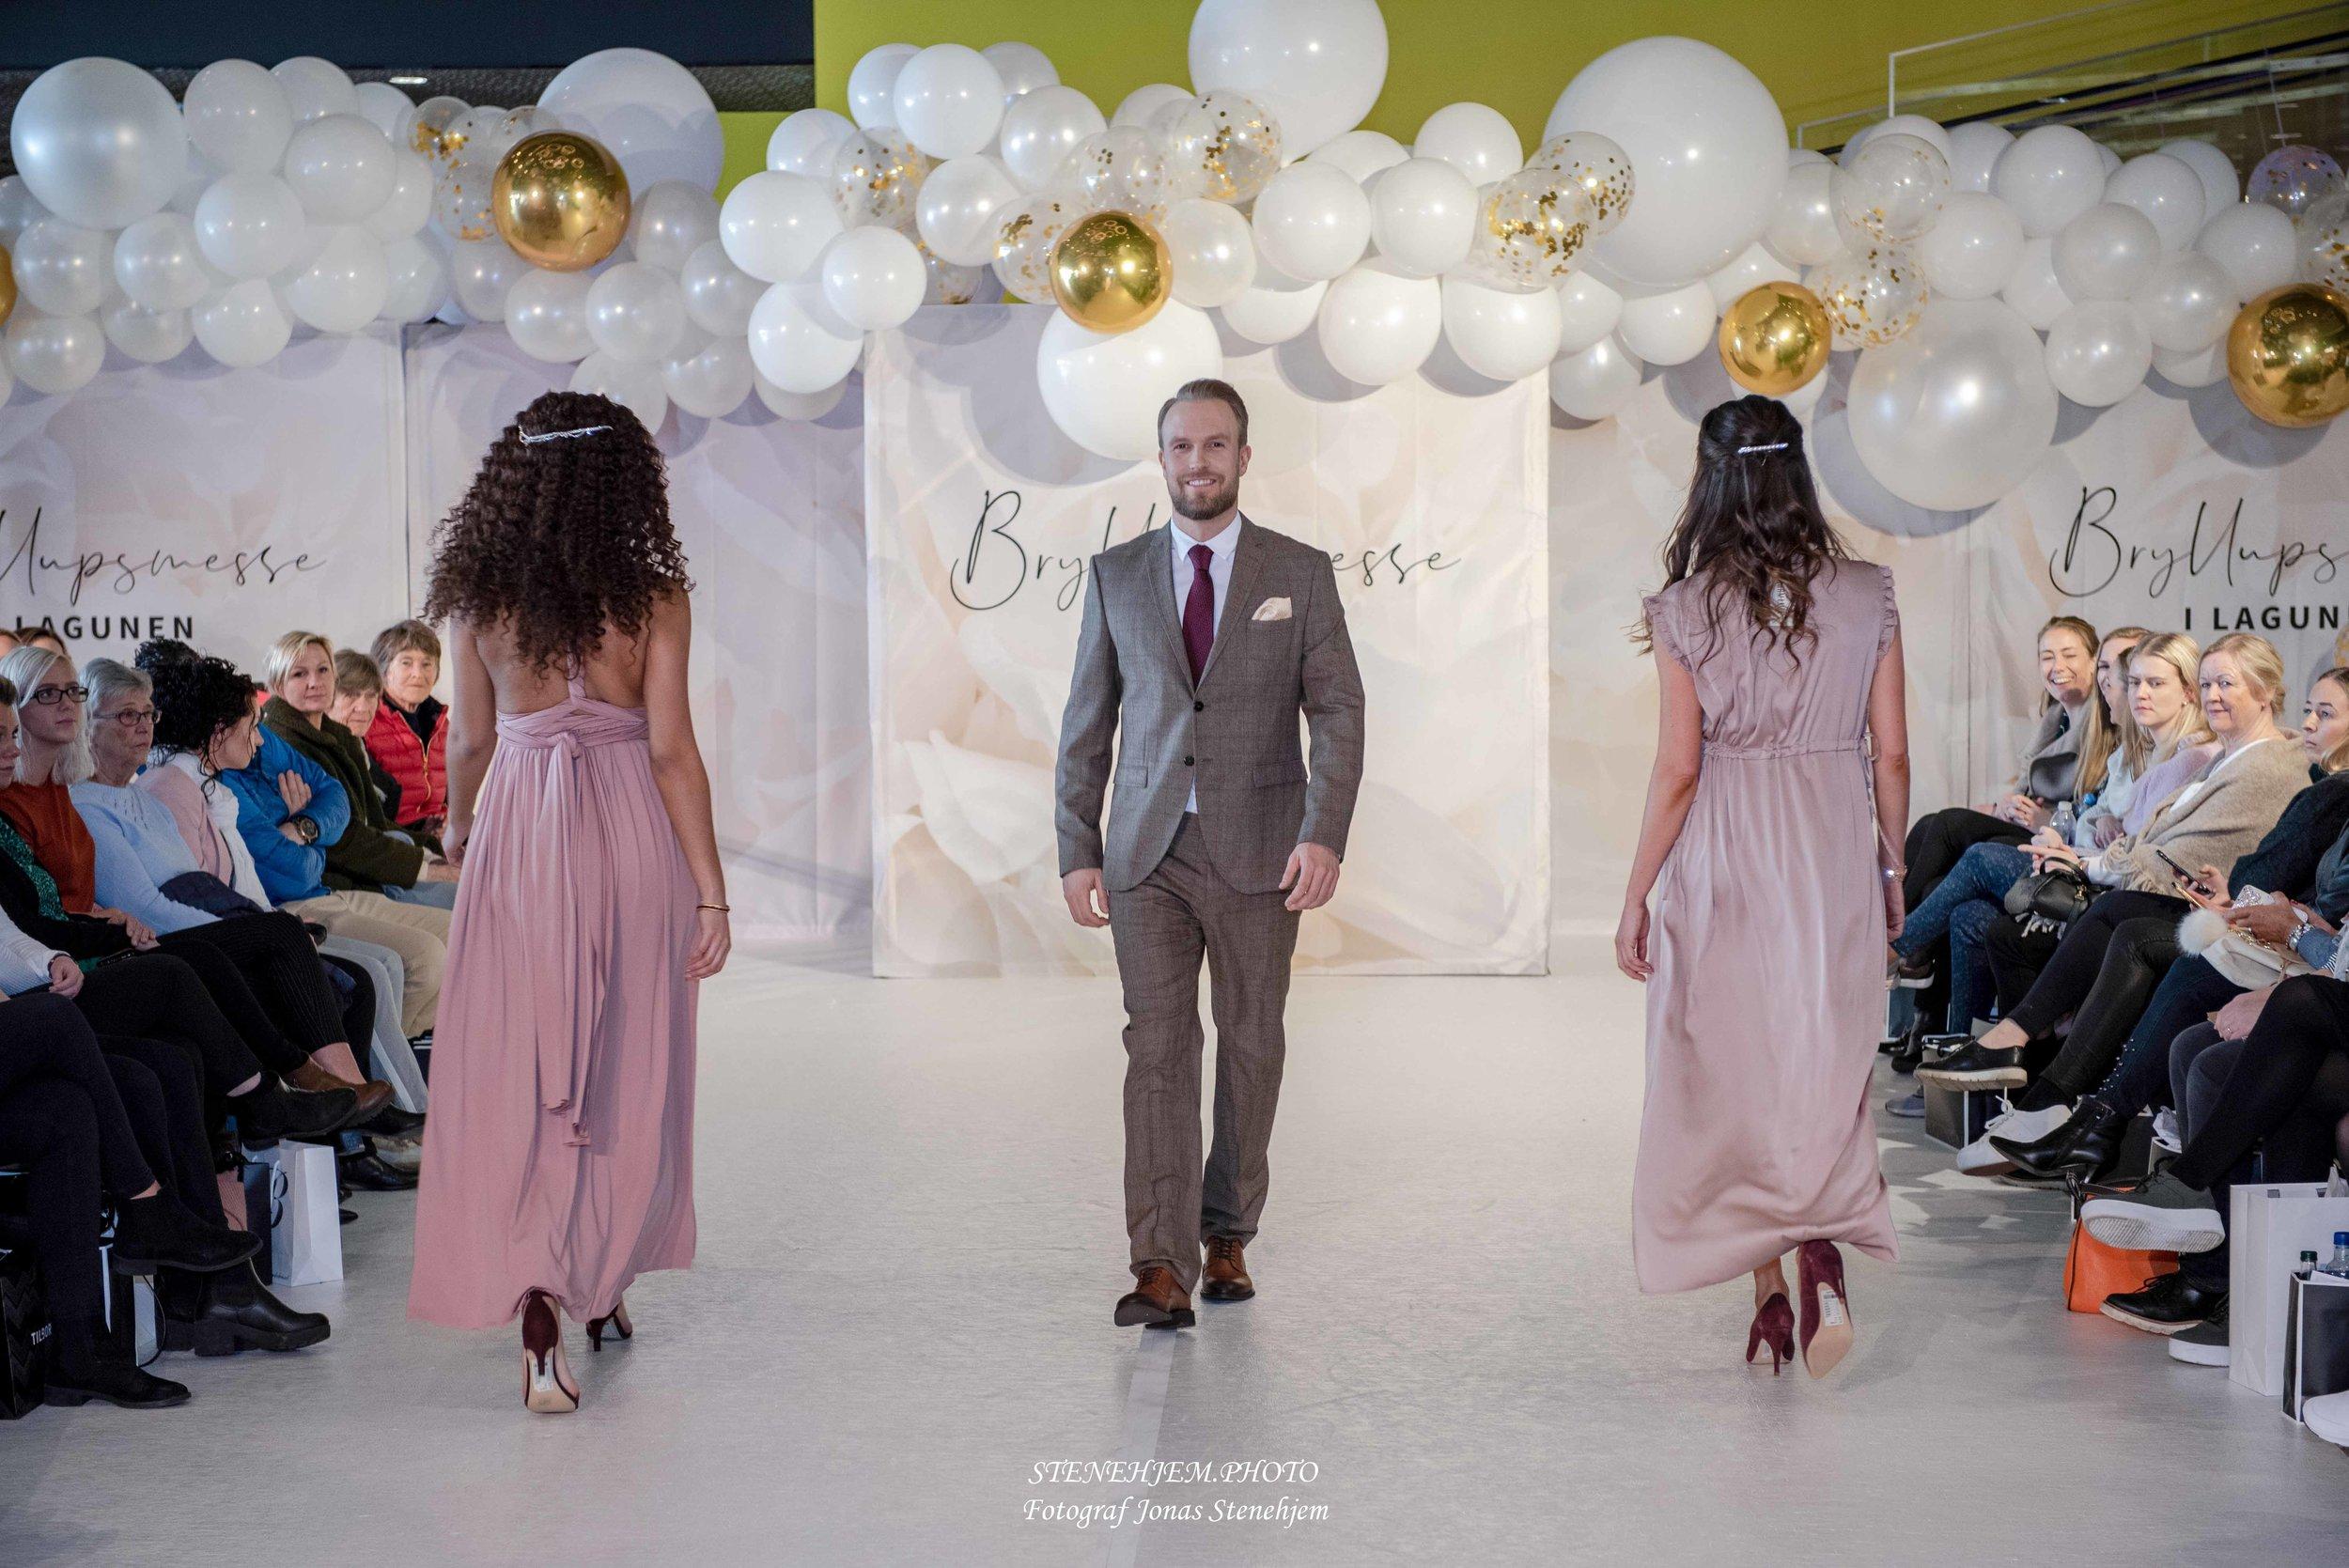 Bryllupsmesse_Lagunen_mittaltweddingfair__063.jpg